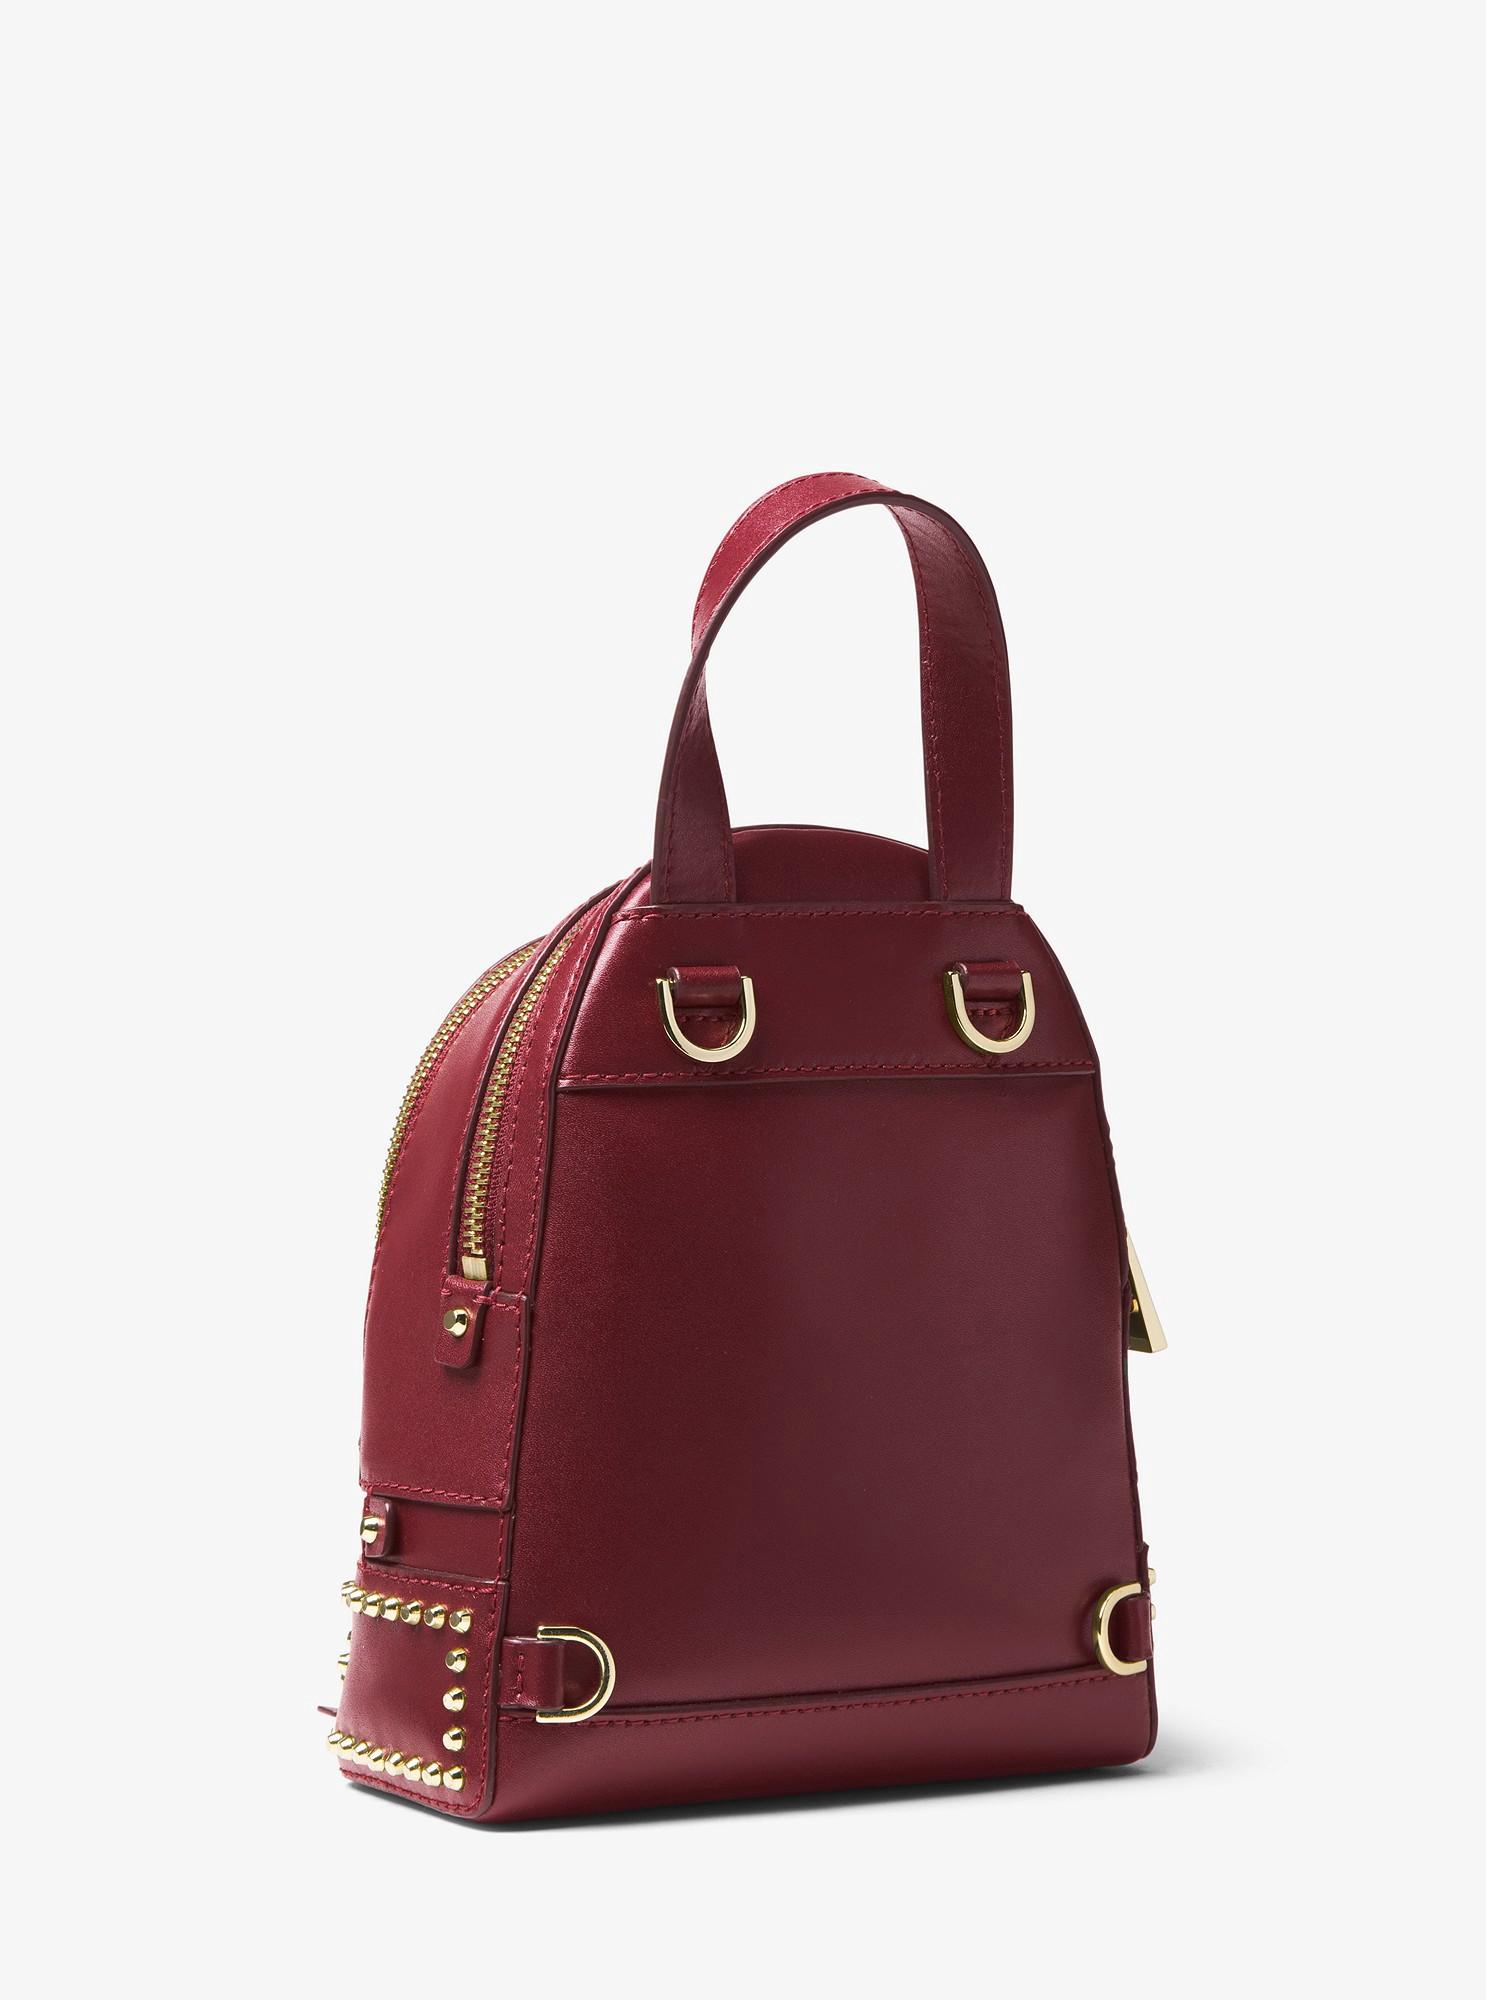 c4f299b04a76 Michael Kors Rhea Mini Studded Leather Backpack - Oxblood | Products ...